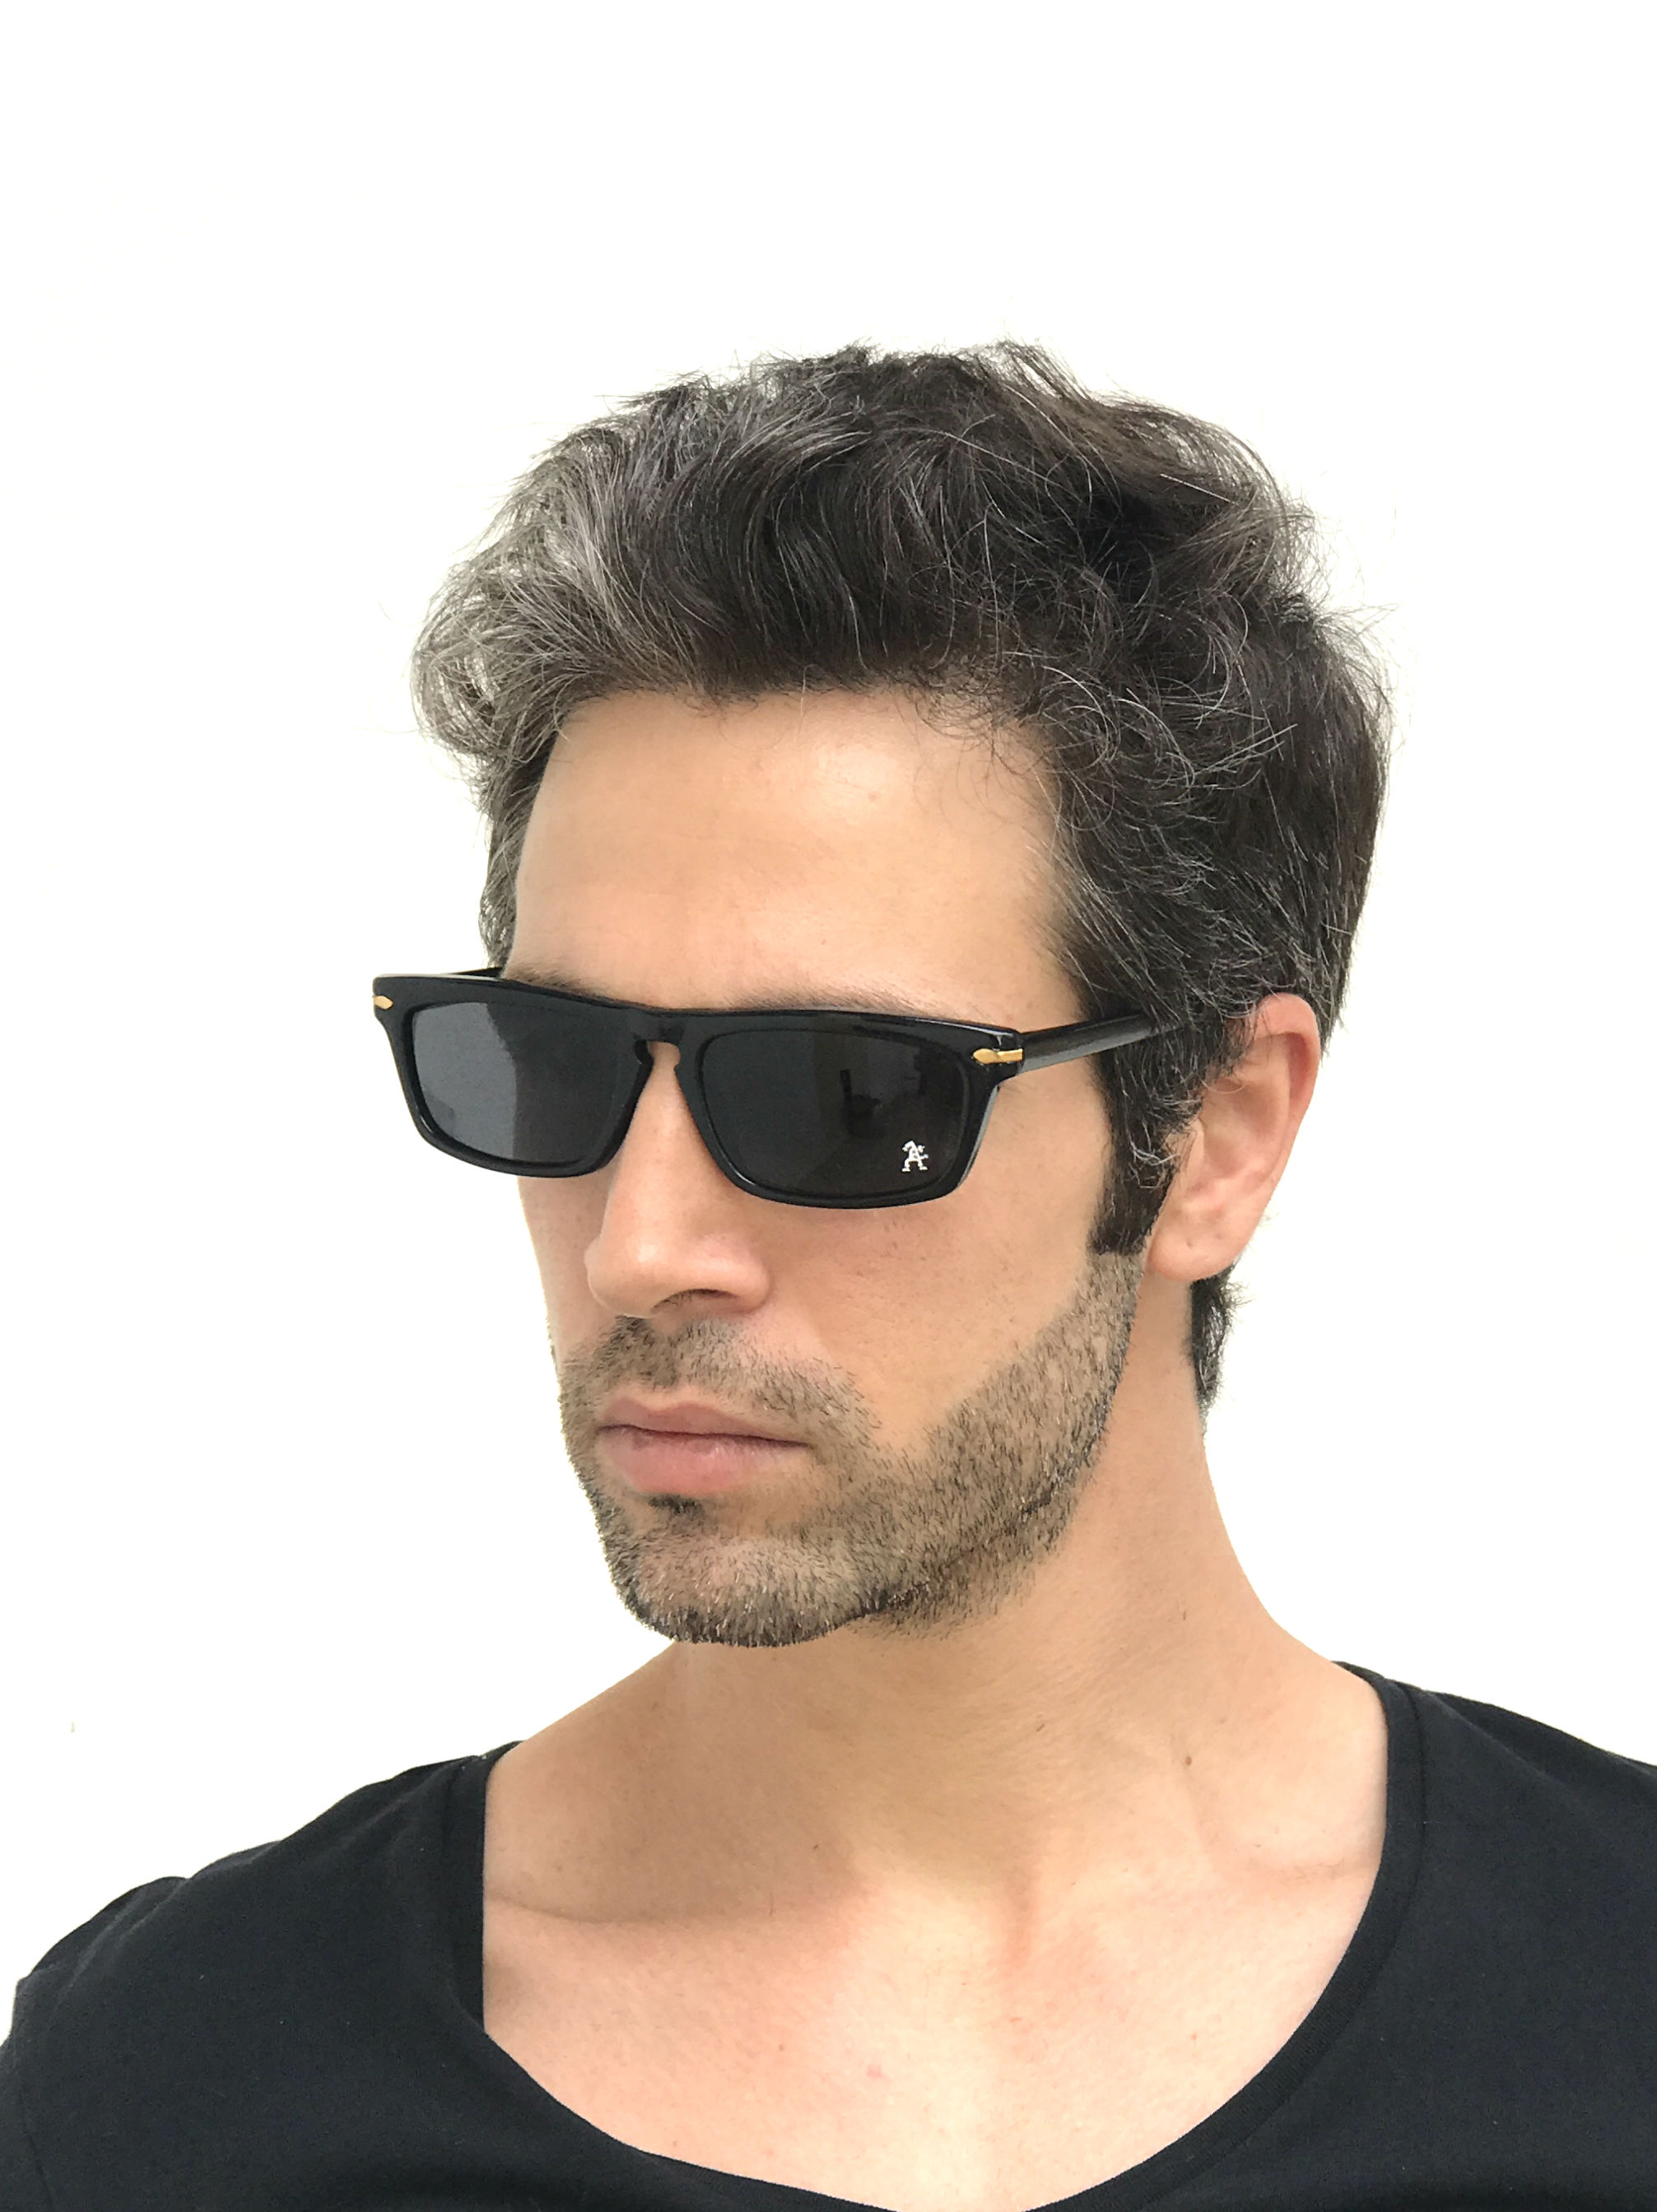 020042bd8f Black oblong sunglasses for men NOS 90 s punk era